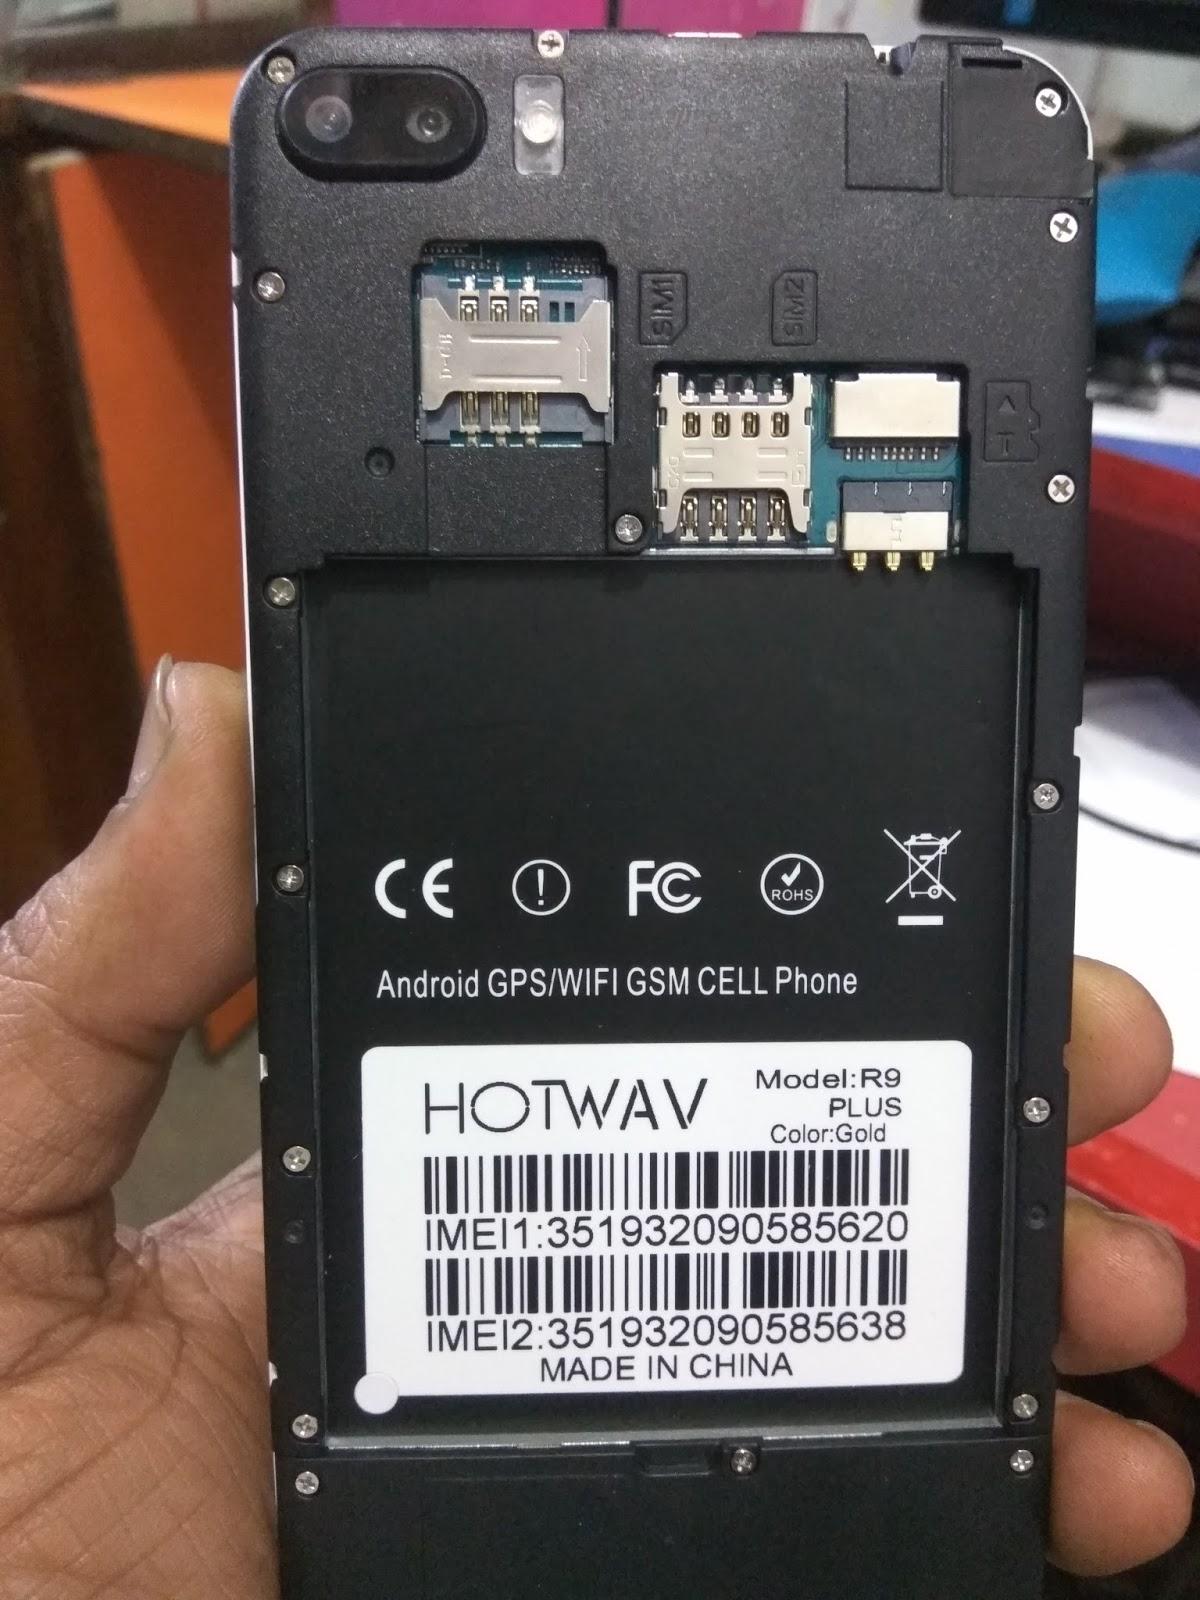 RAHIM TELECOM: HOTWAV R9 PLUS SPD SC7731 FLASH FILE 6 0 PAC